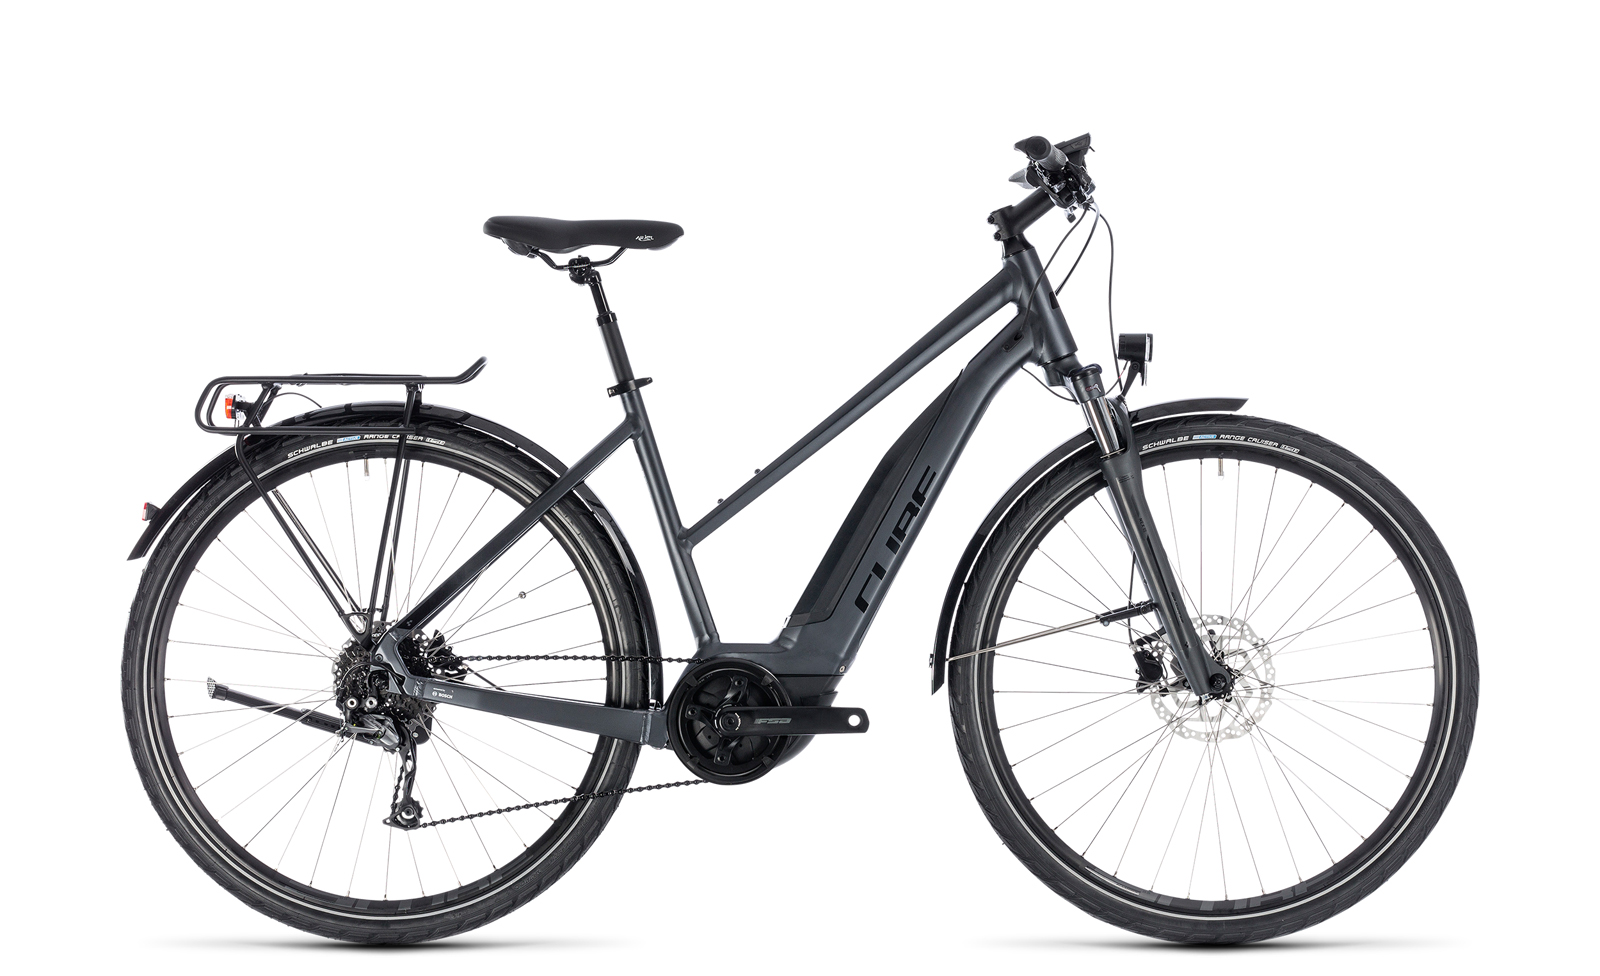 cube touring hybrid one 500 damen trekking pedelec e bike. Black Bedroom Furniture Sets. Home Design Ideas